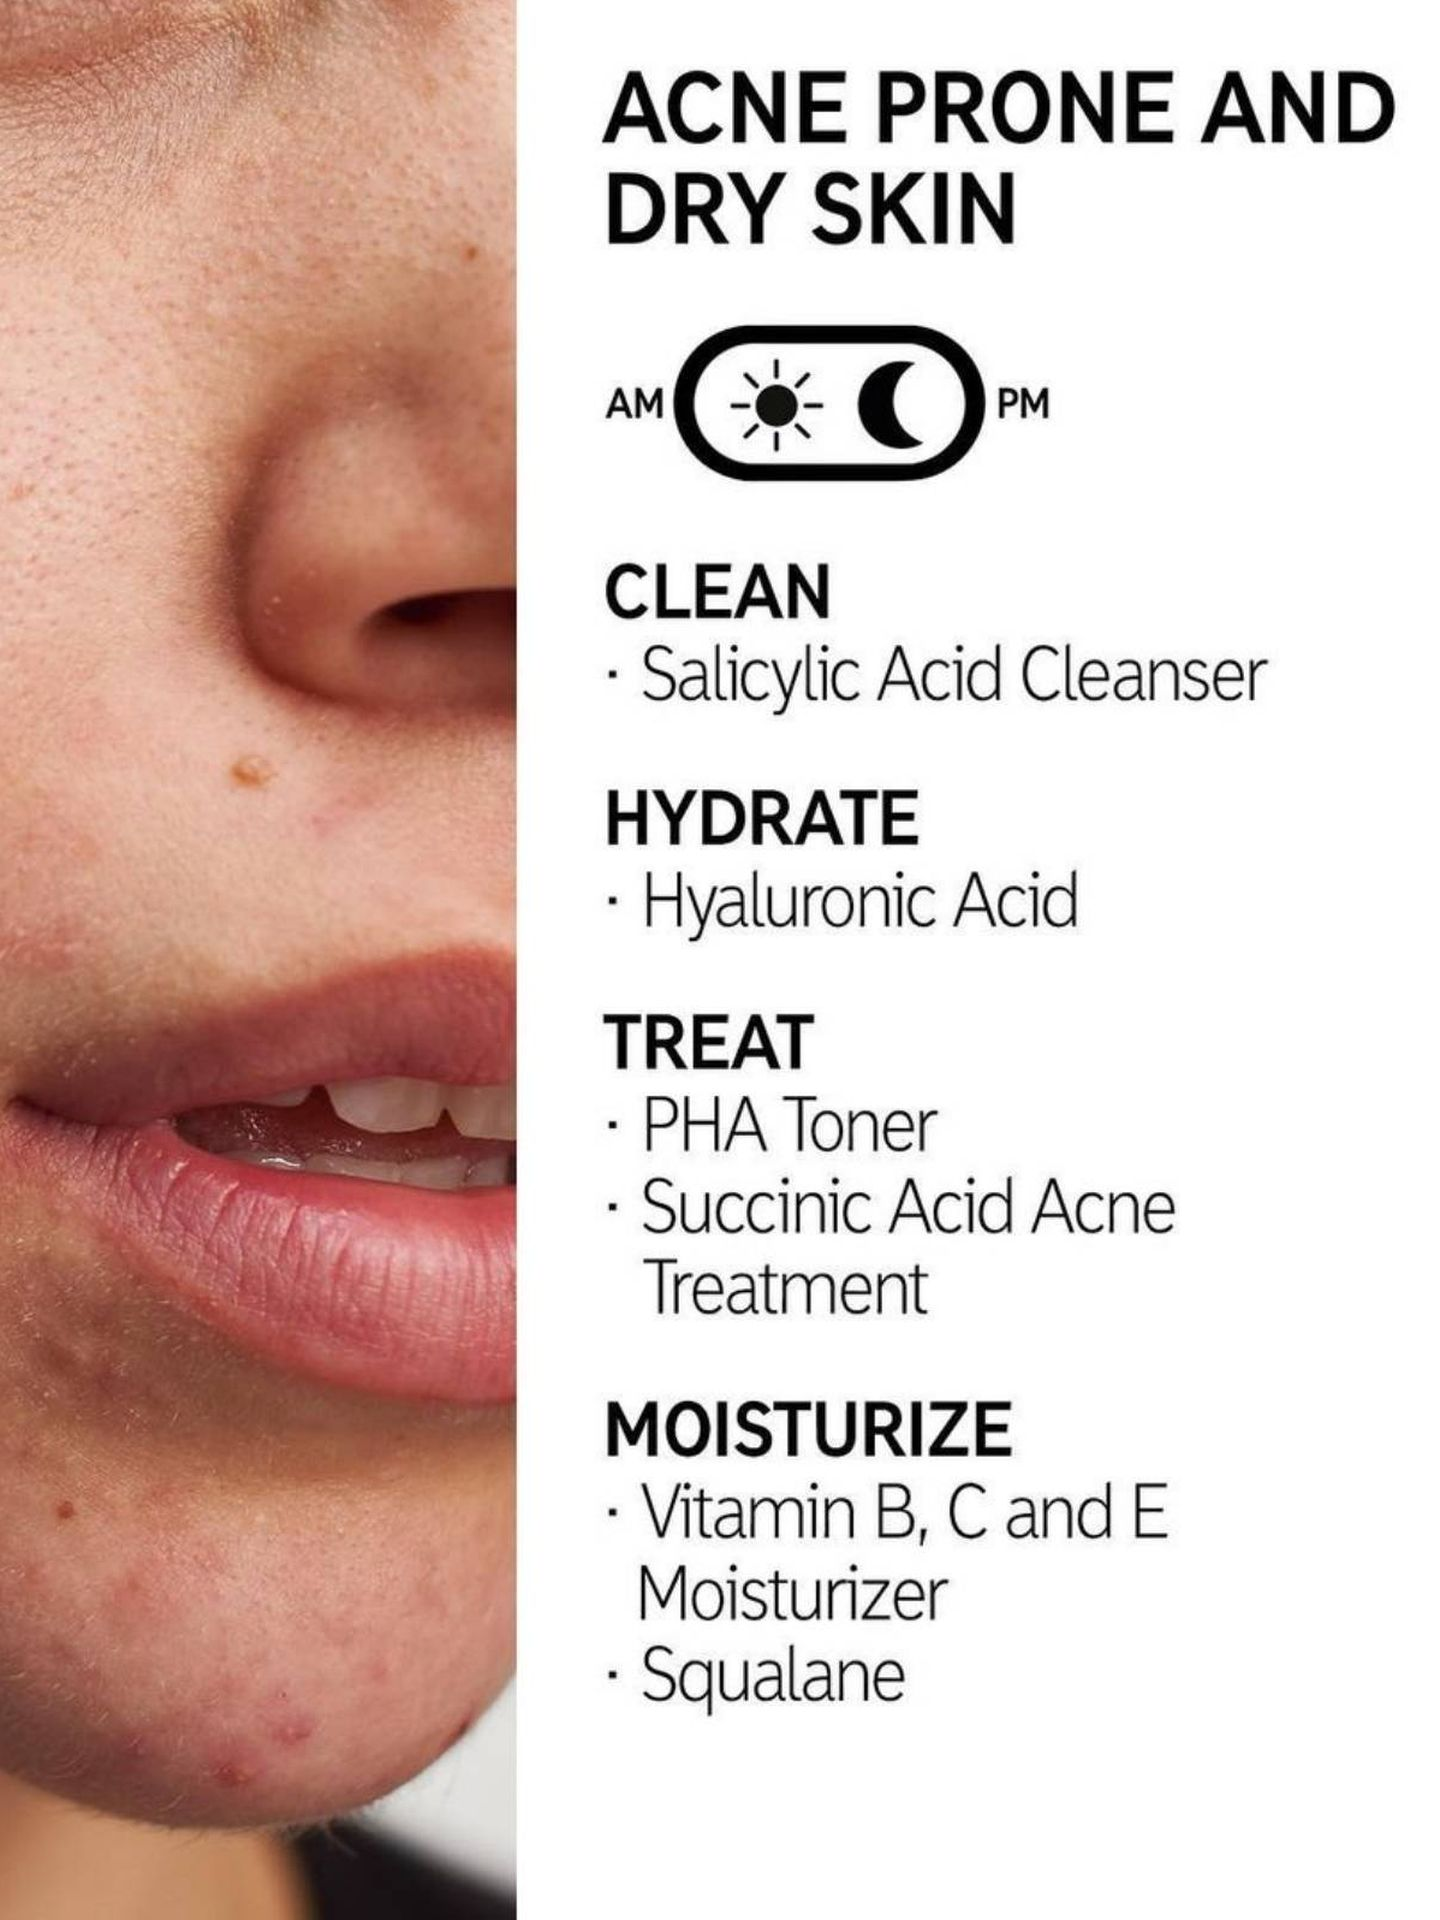 Consejos de The Inkey List para pieles secas y con acné. (Instagram @theinkeylist)